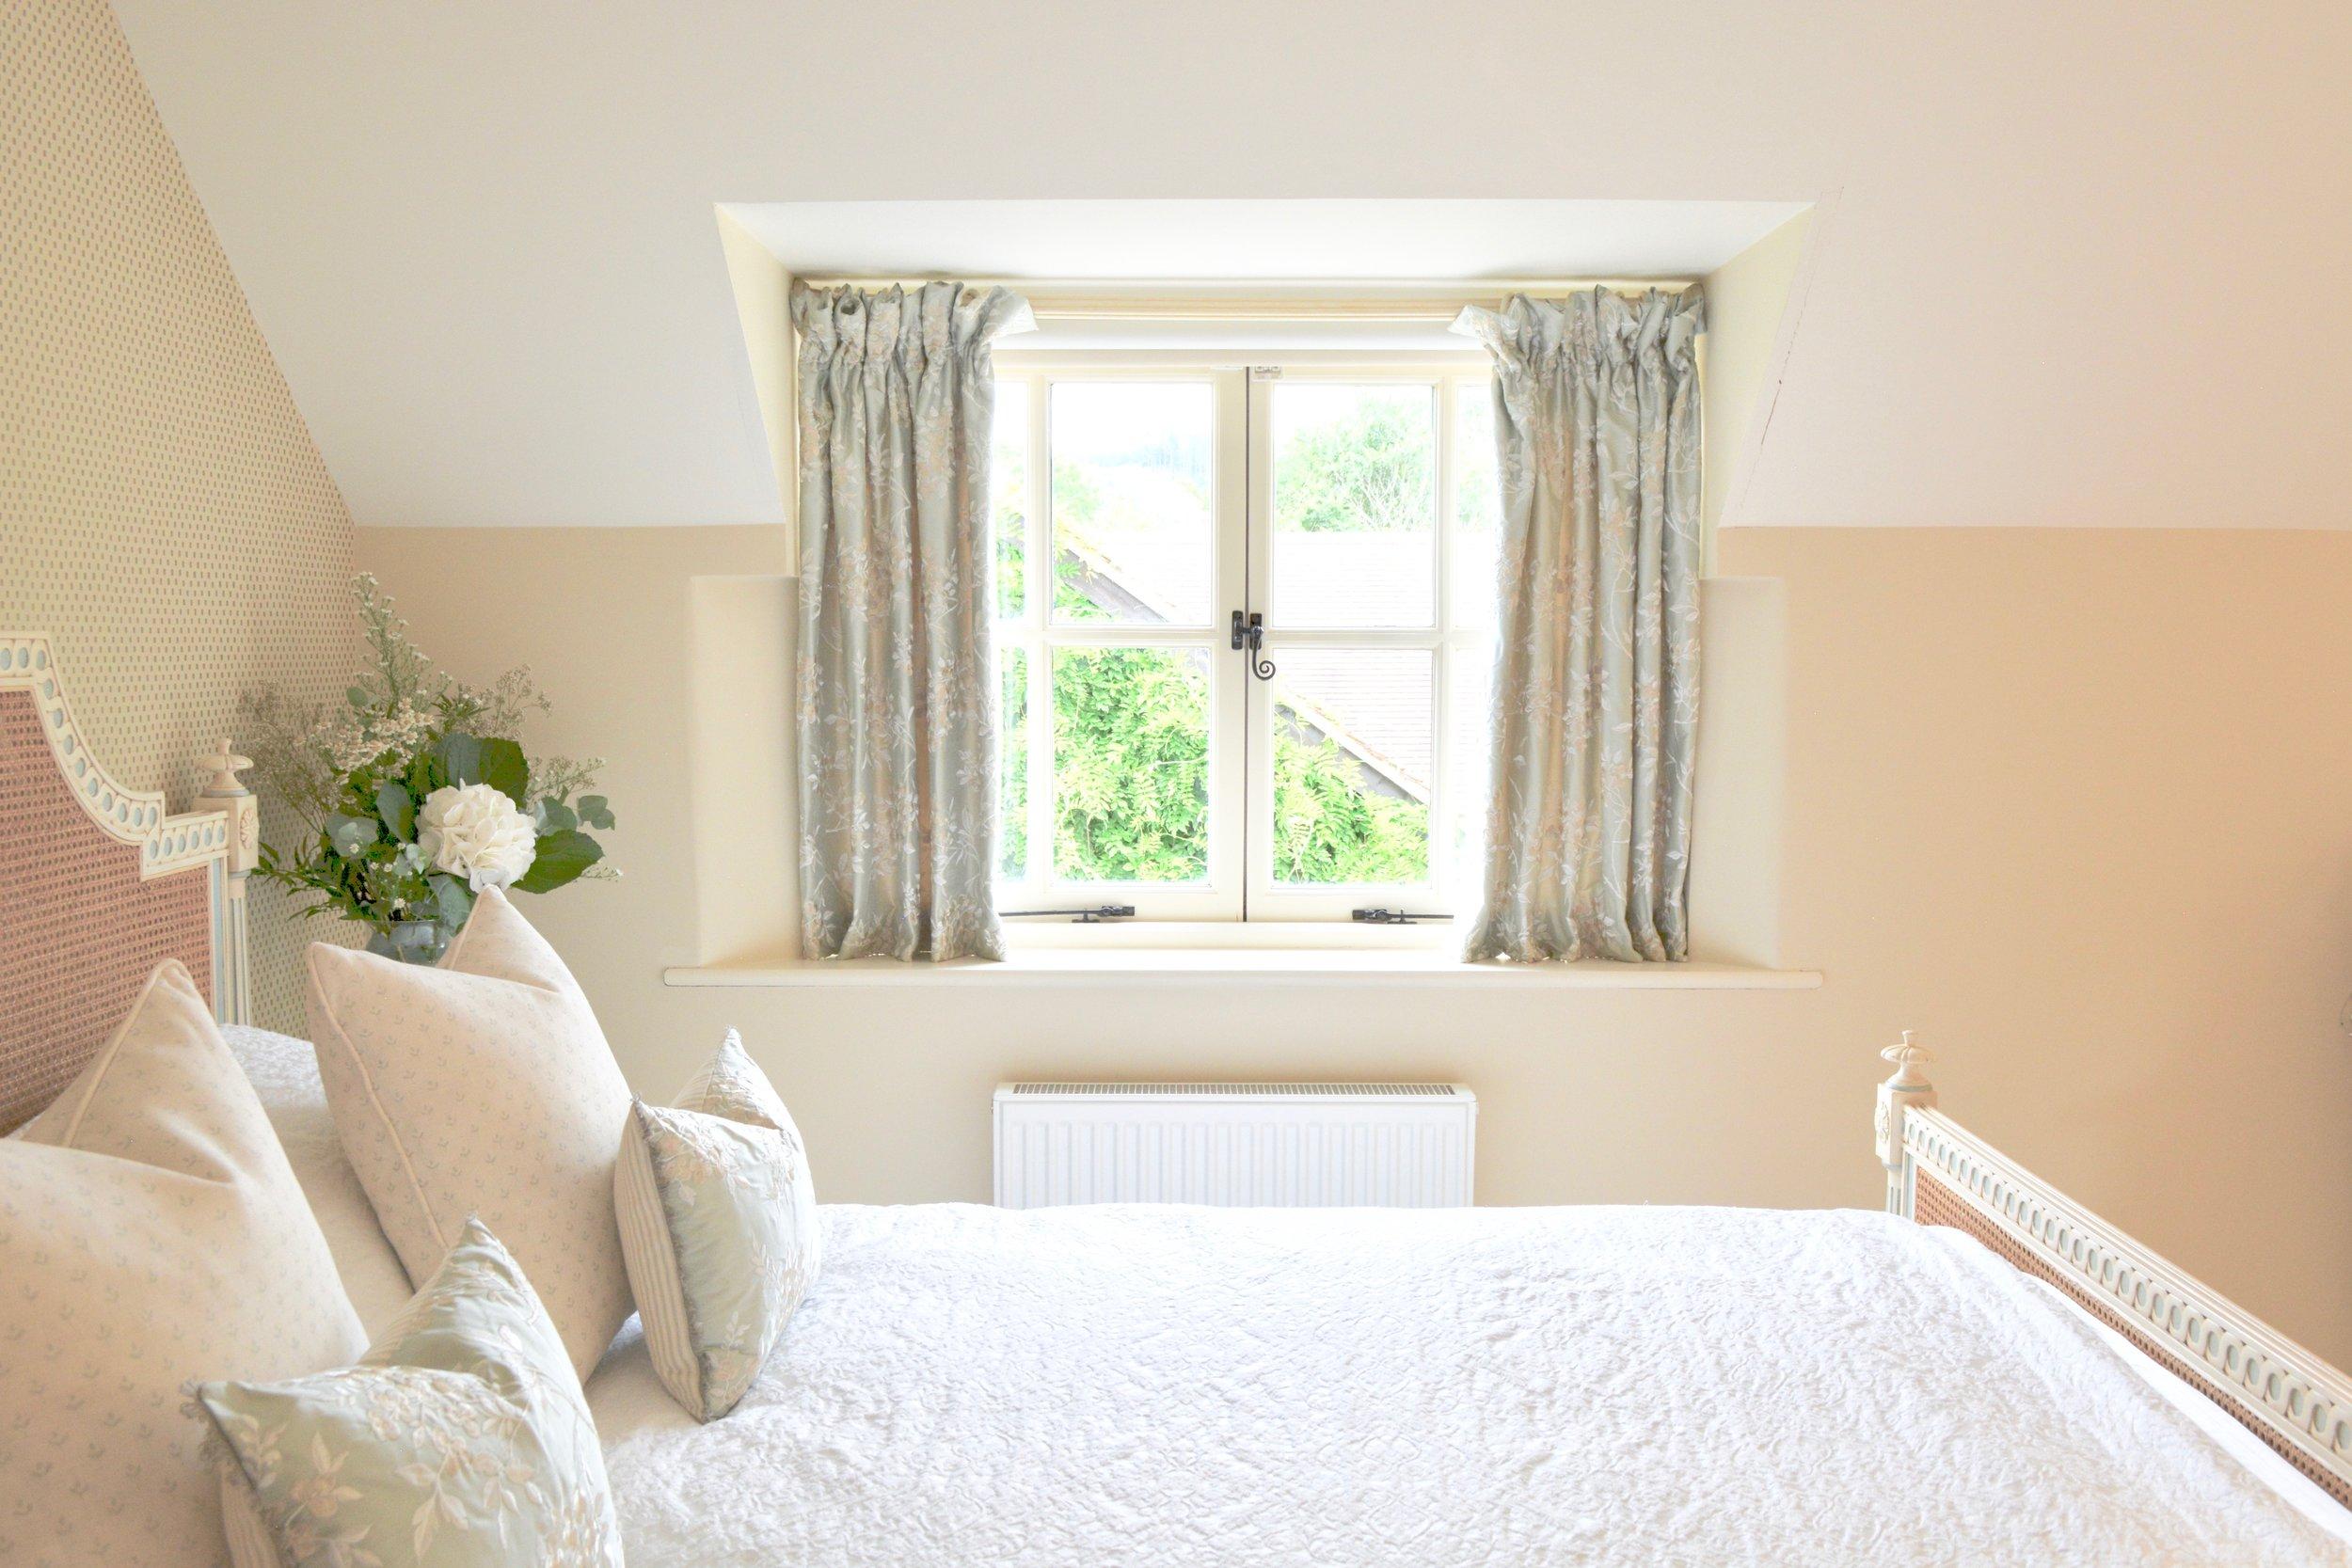 Country Cottage Bedroom Designed by Hannah Llewelyn Interior Design www.hlinteriors.co.uk 3.jpg